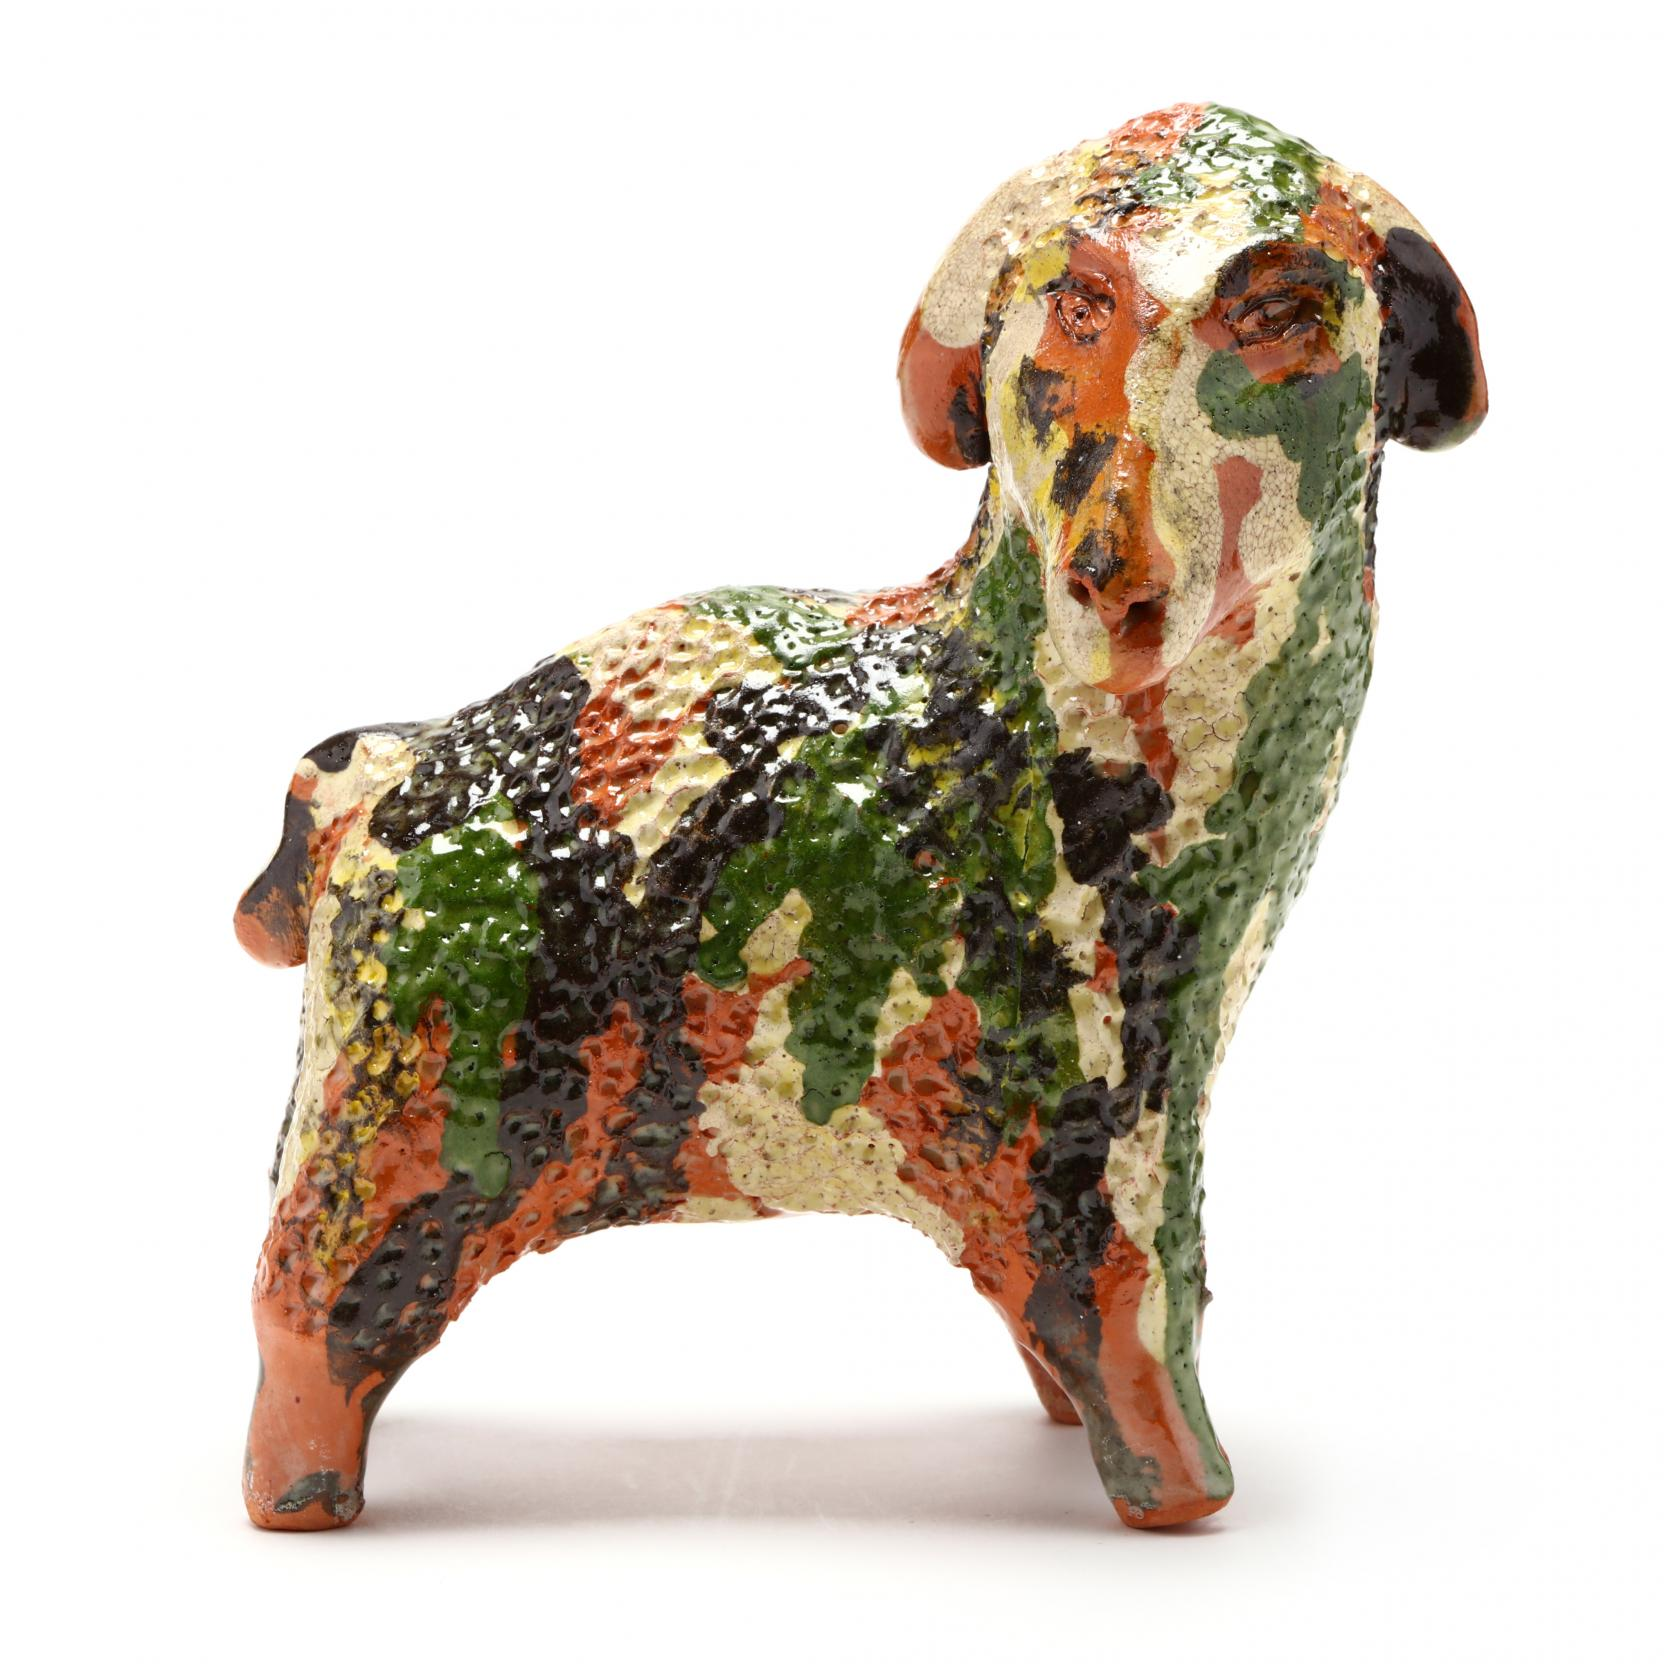 nc-folk-pottery-billy-ray-hussey-sheep-figurine